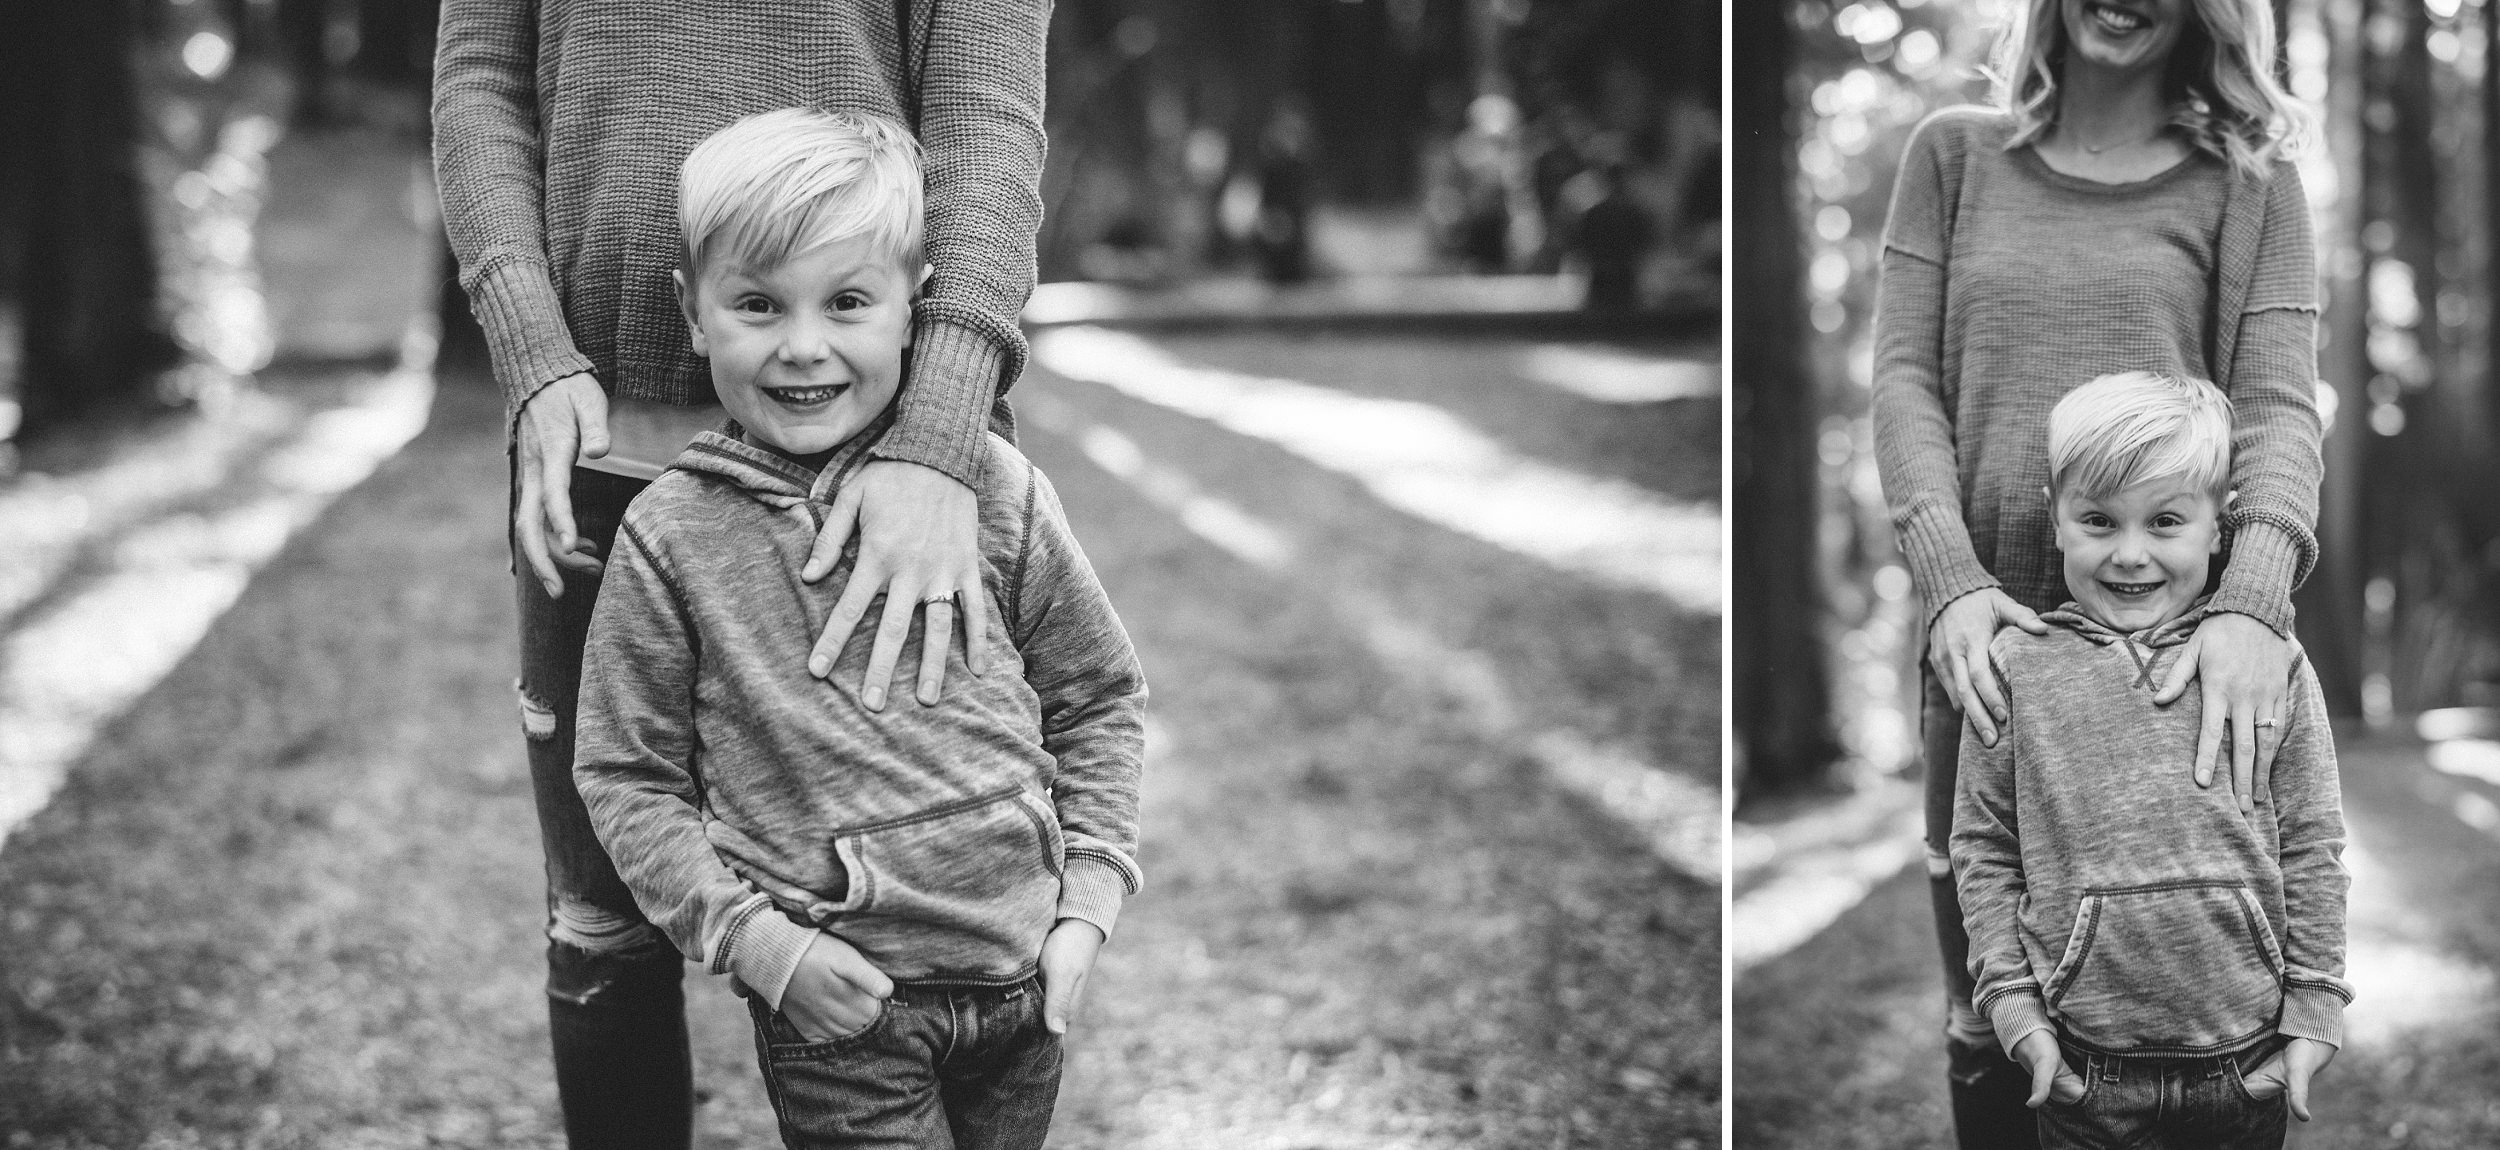 Joaquin-Miller-Park-Oakland-Family-Photography-007.jpg